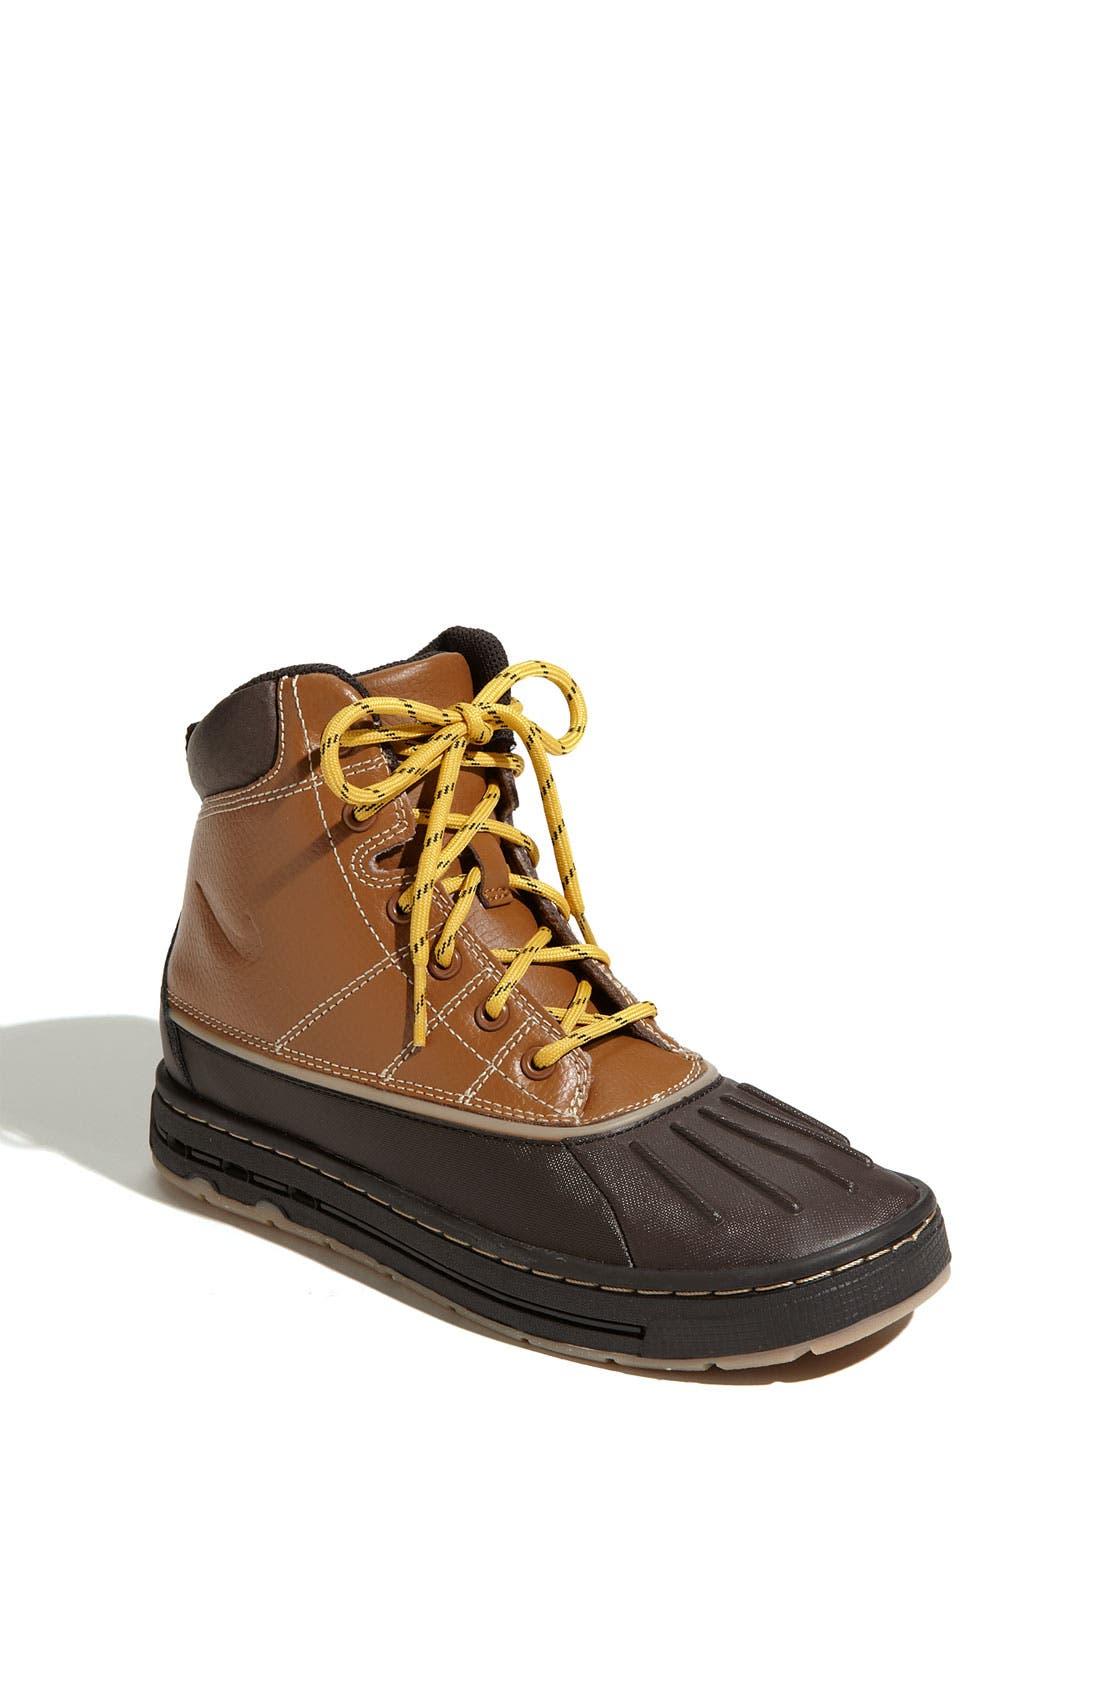 Main Image - Nike 'Woodside' Hiking Boot (Toddler, Little Kid & Big Kid)